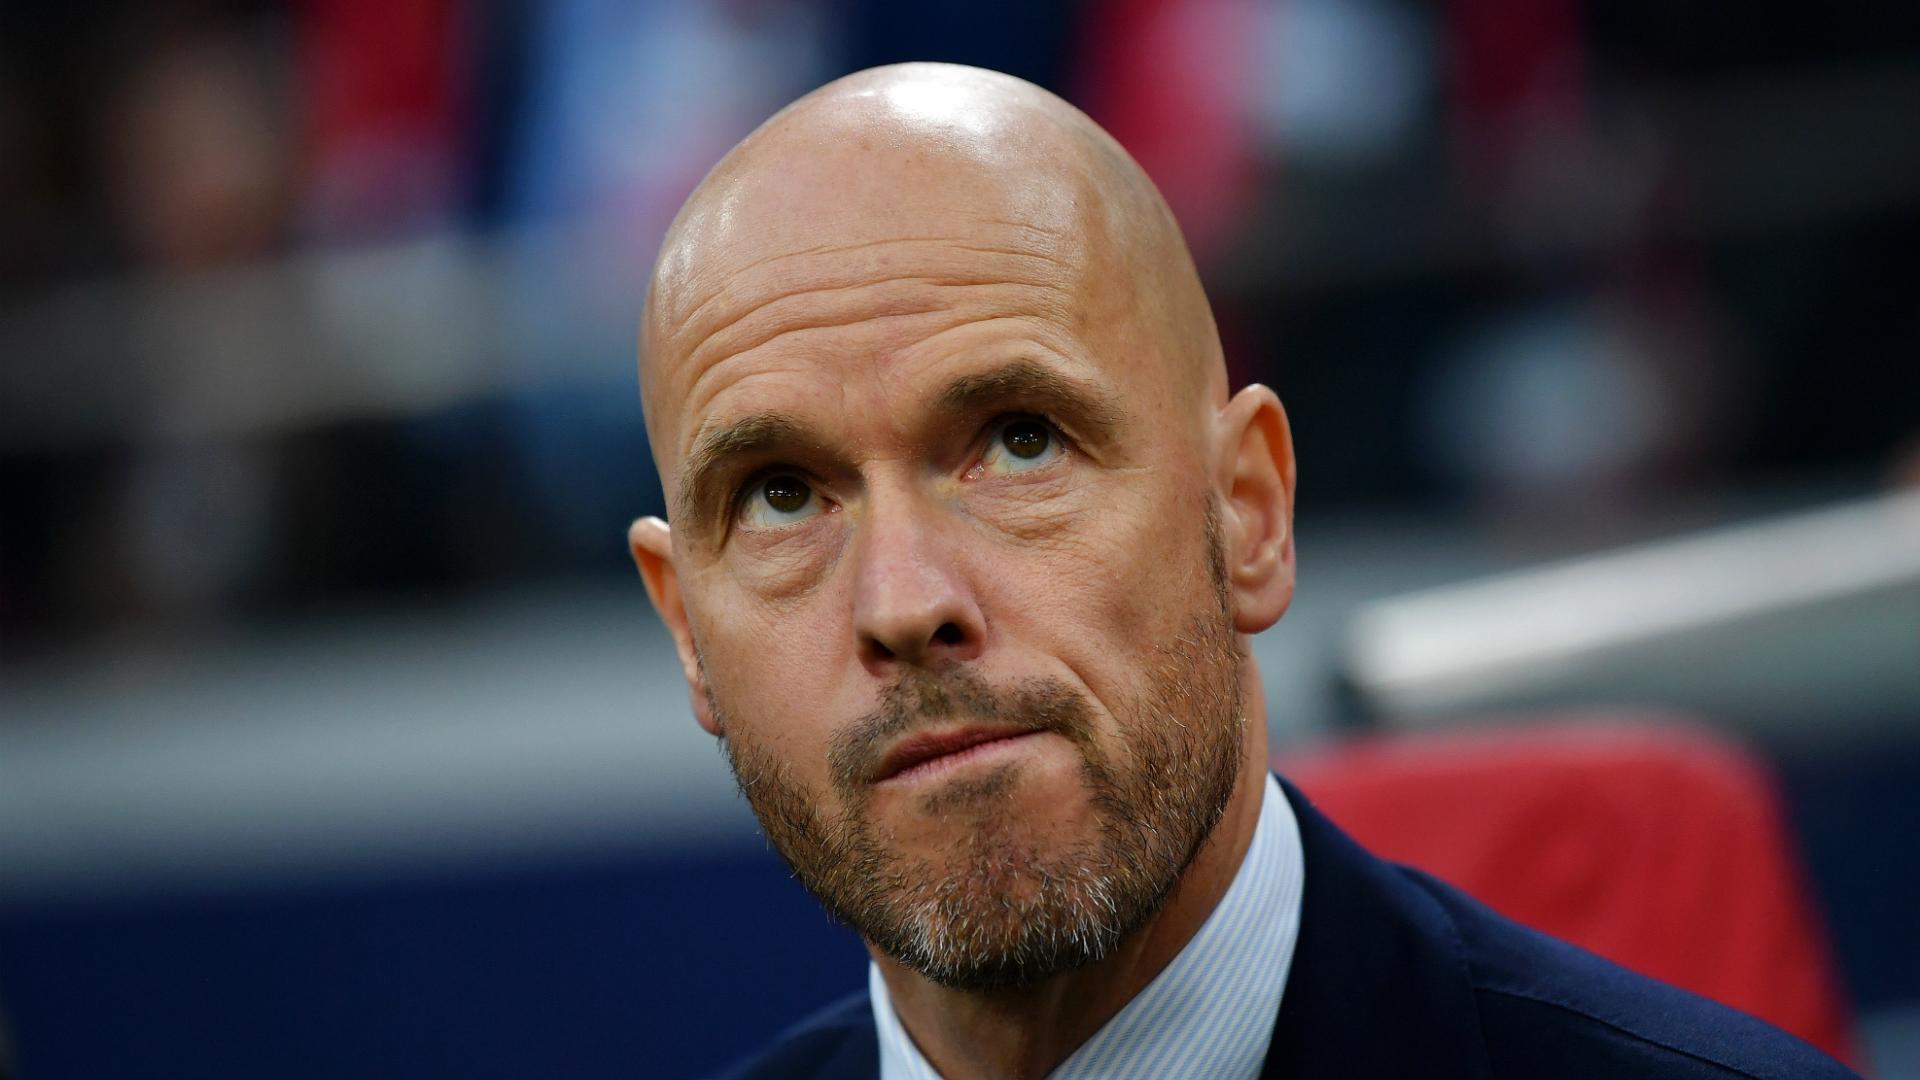 Ten Hag bemoans poor fortune after Ajax's premature Champions League exit